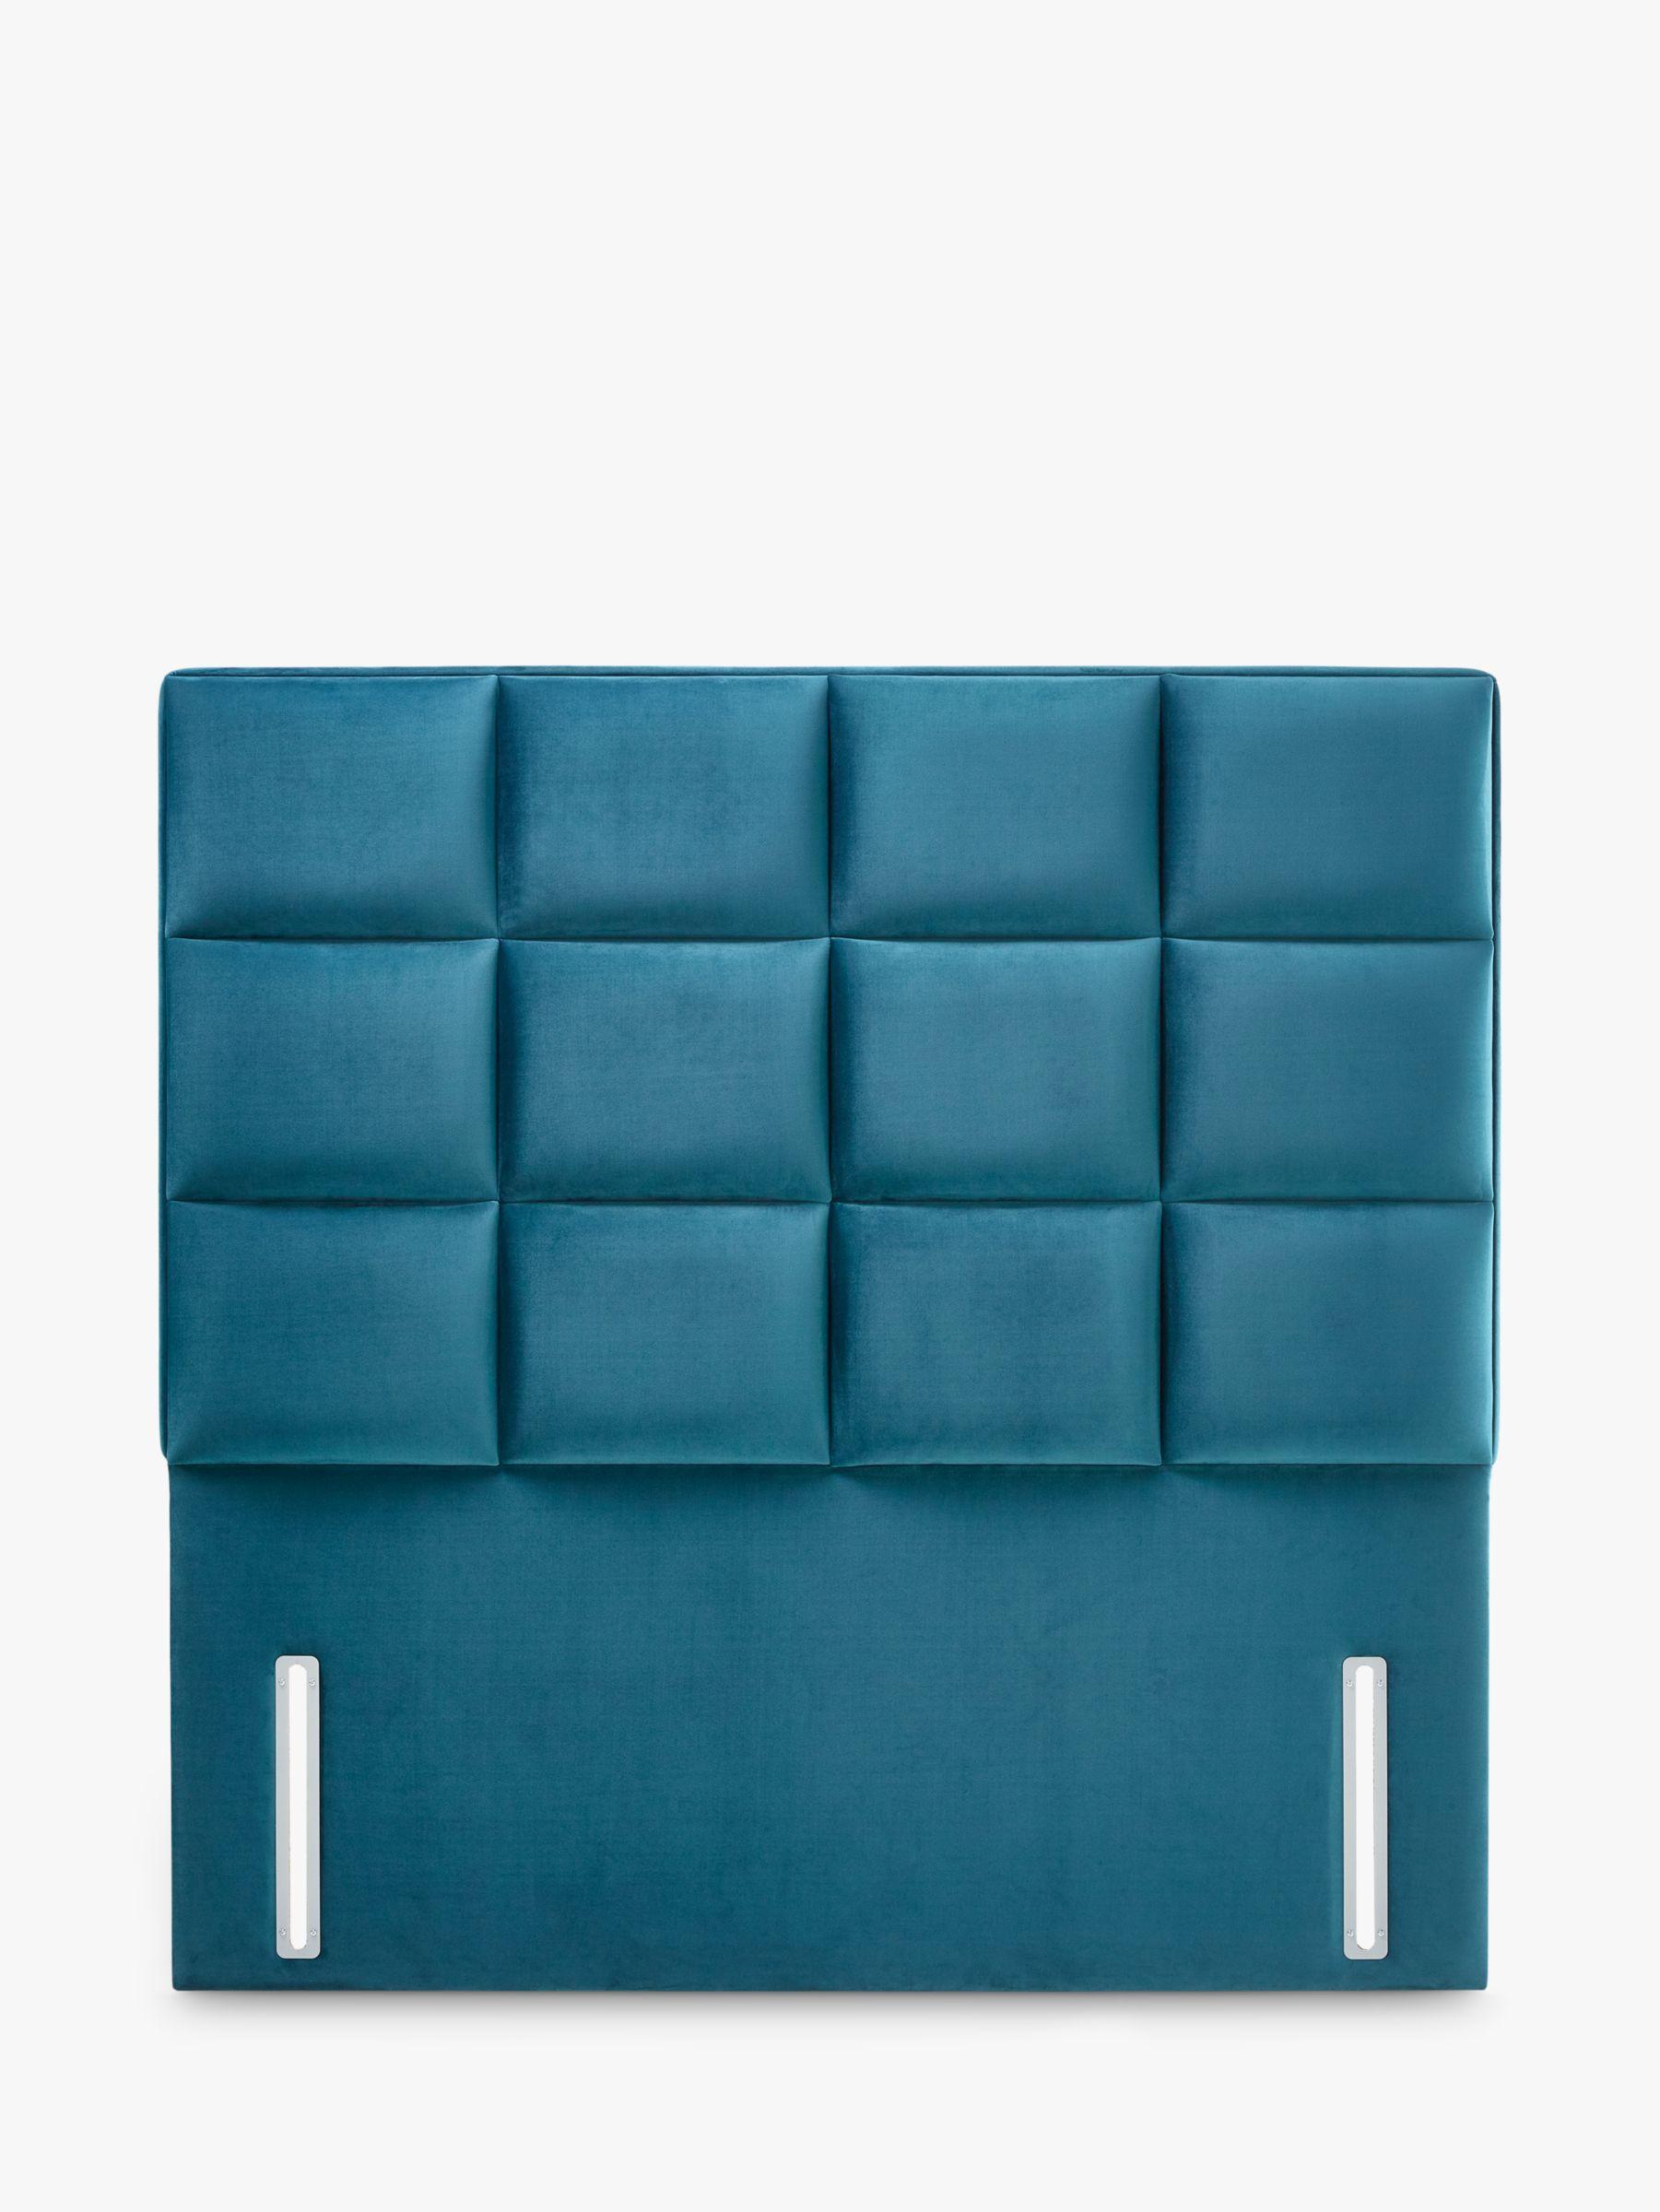 John Lewis Partners Natural Collection Gloucester Upholstered Headboard Super King Size Opulence Teal At John Lewis Partners